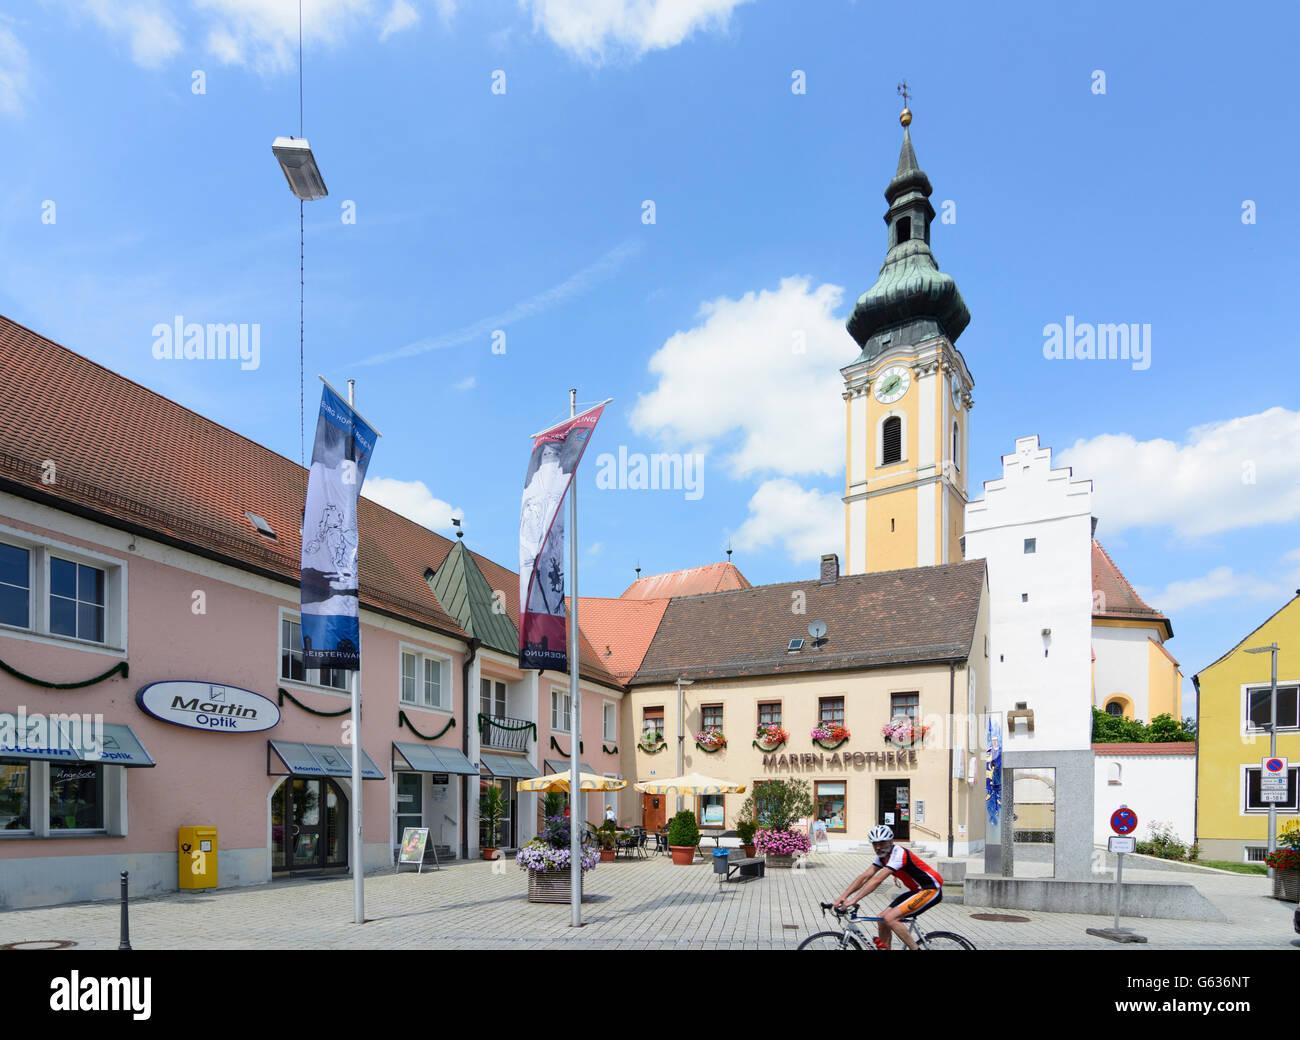 mainstreet, church Unsere Liebe Frau, Nittenau, Germany, Bayern, Bavaria, Oberpfalz, Upper Palatinate - Stock Image